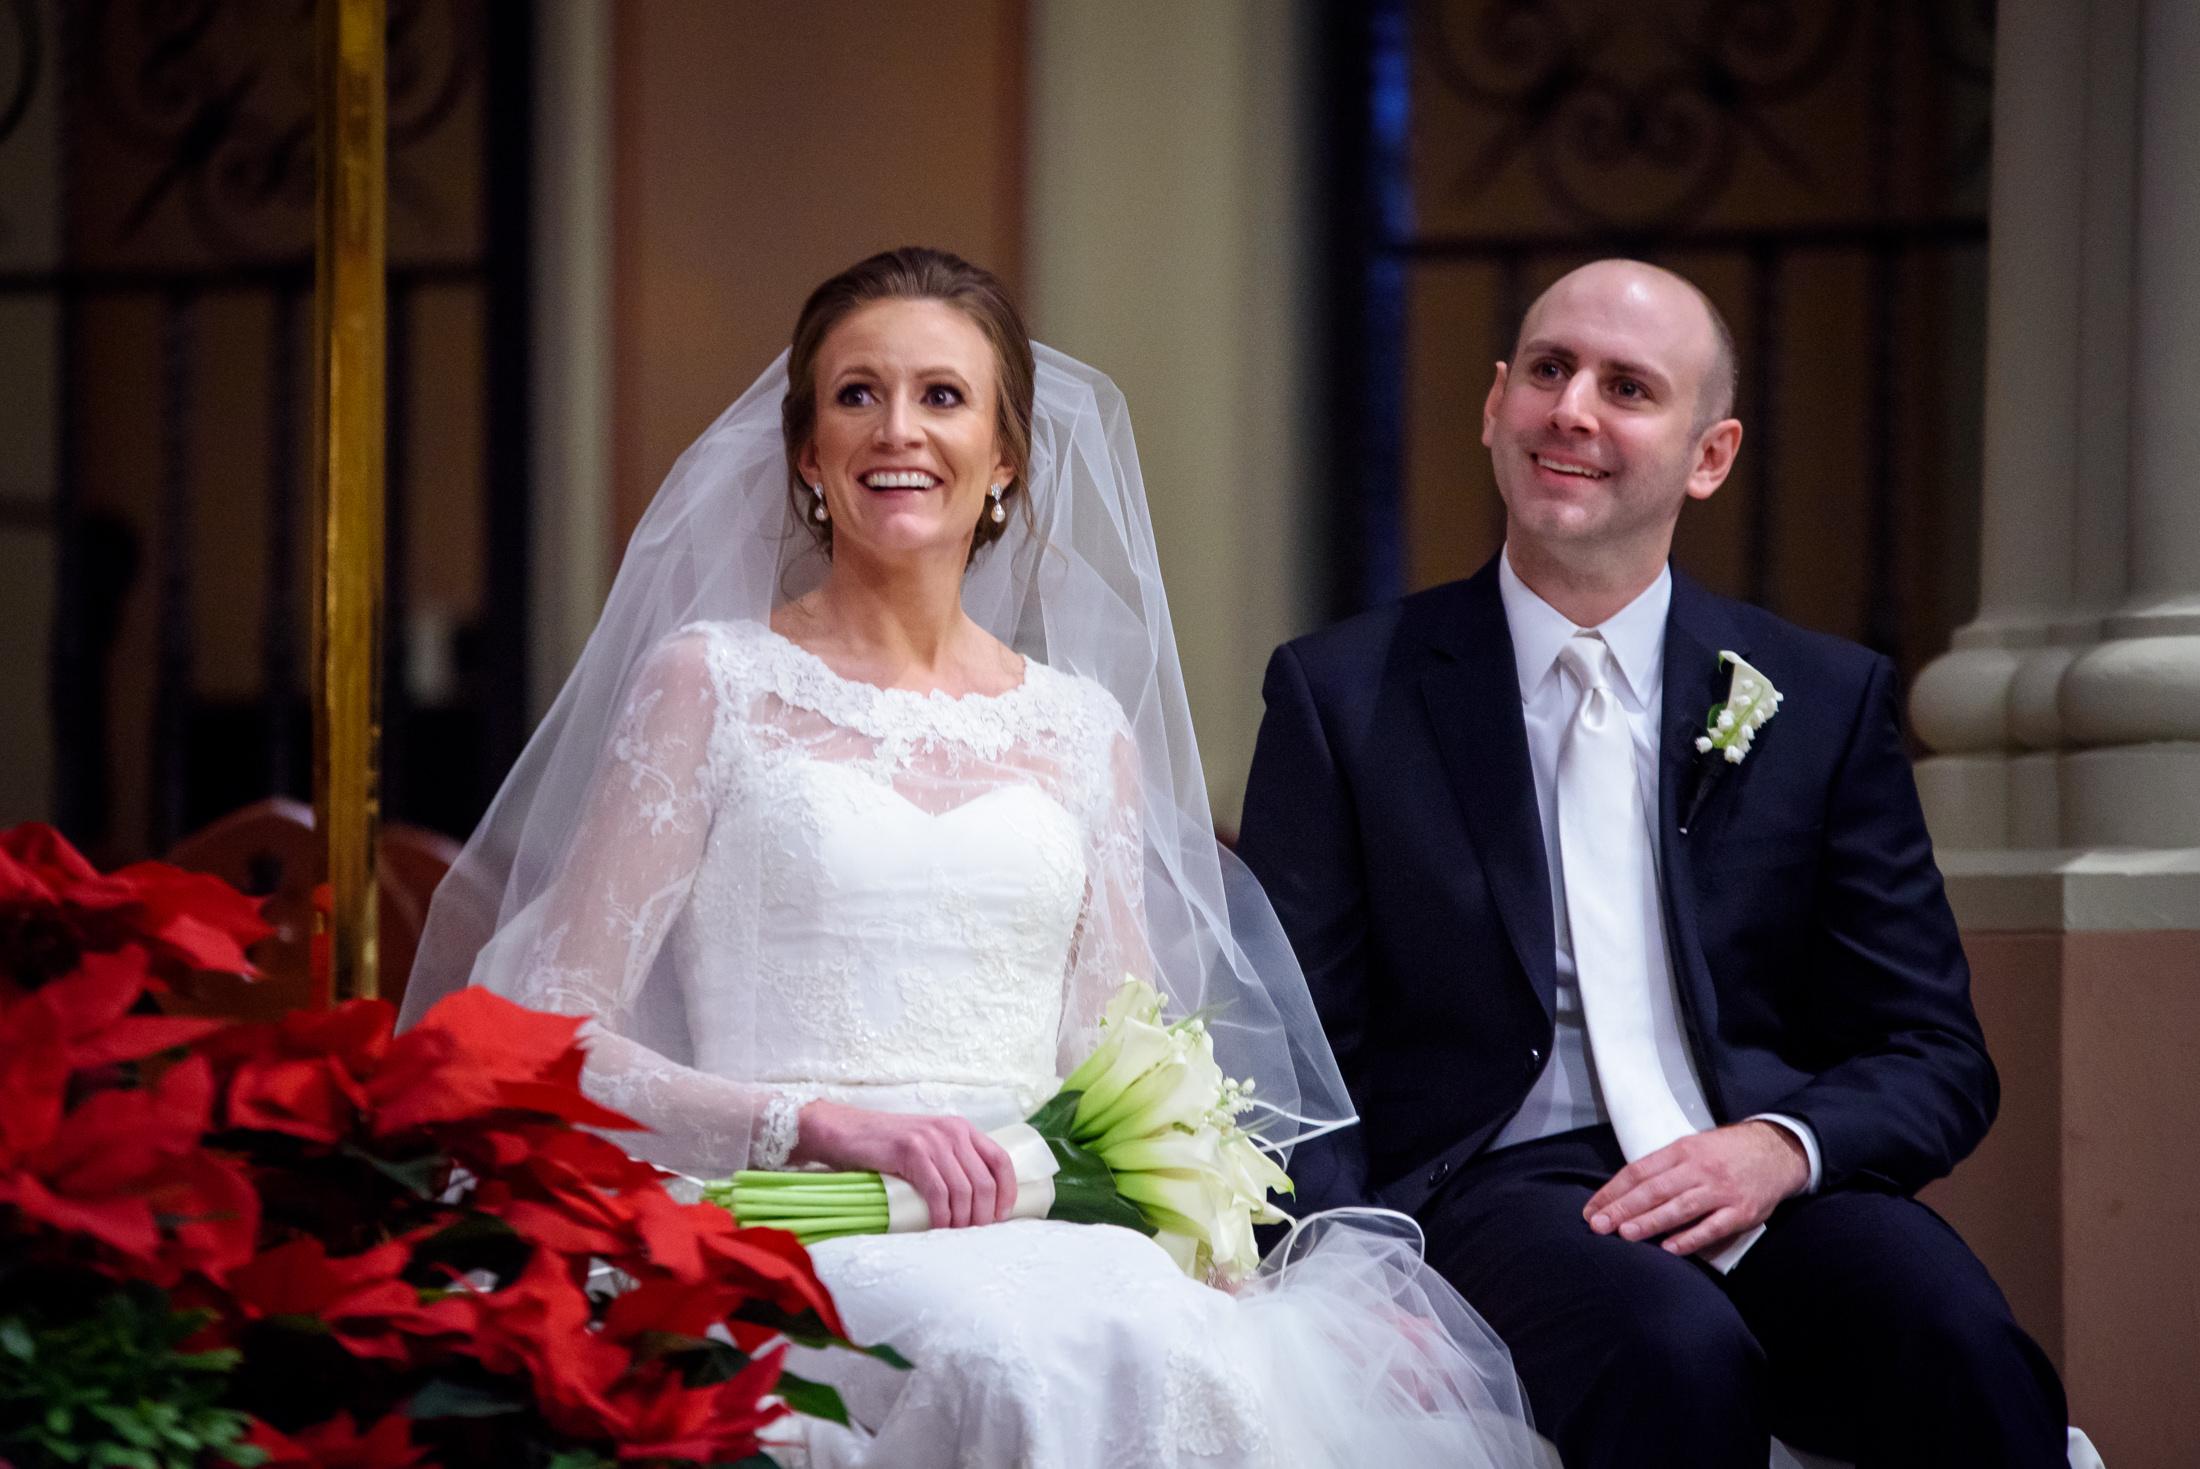 st-johns-creighton-omaha-wedding-photographer-jm-studios-0009.JPG